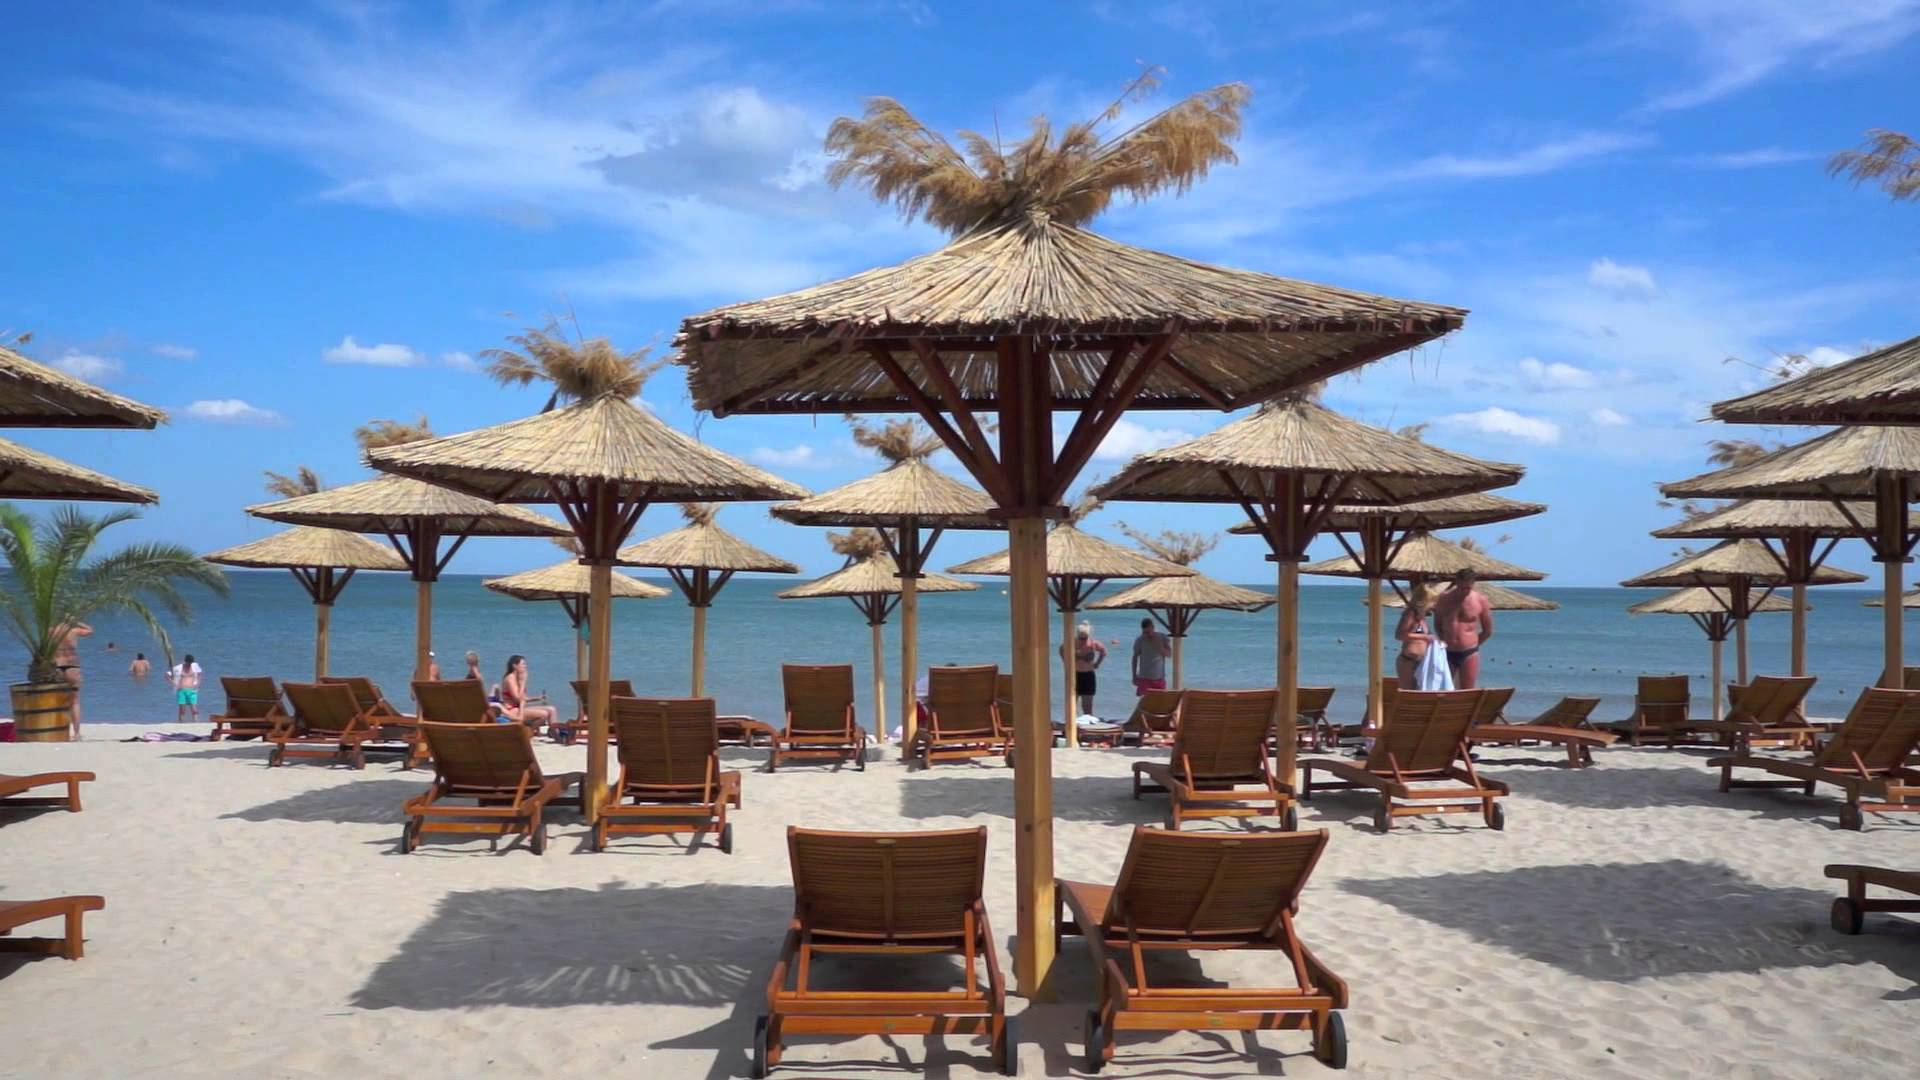 Goldstrand & Sonnenstrand, Bulgarien - Sehenswürdigkeiten am schwarzen Meer (Balkan Folge 01)